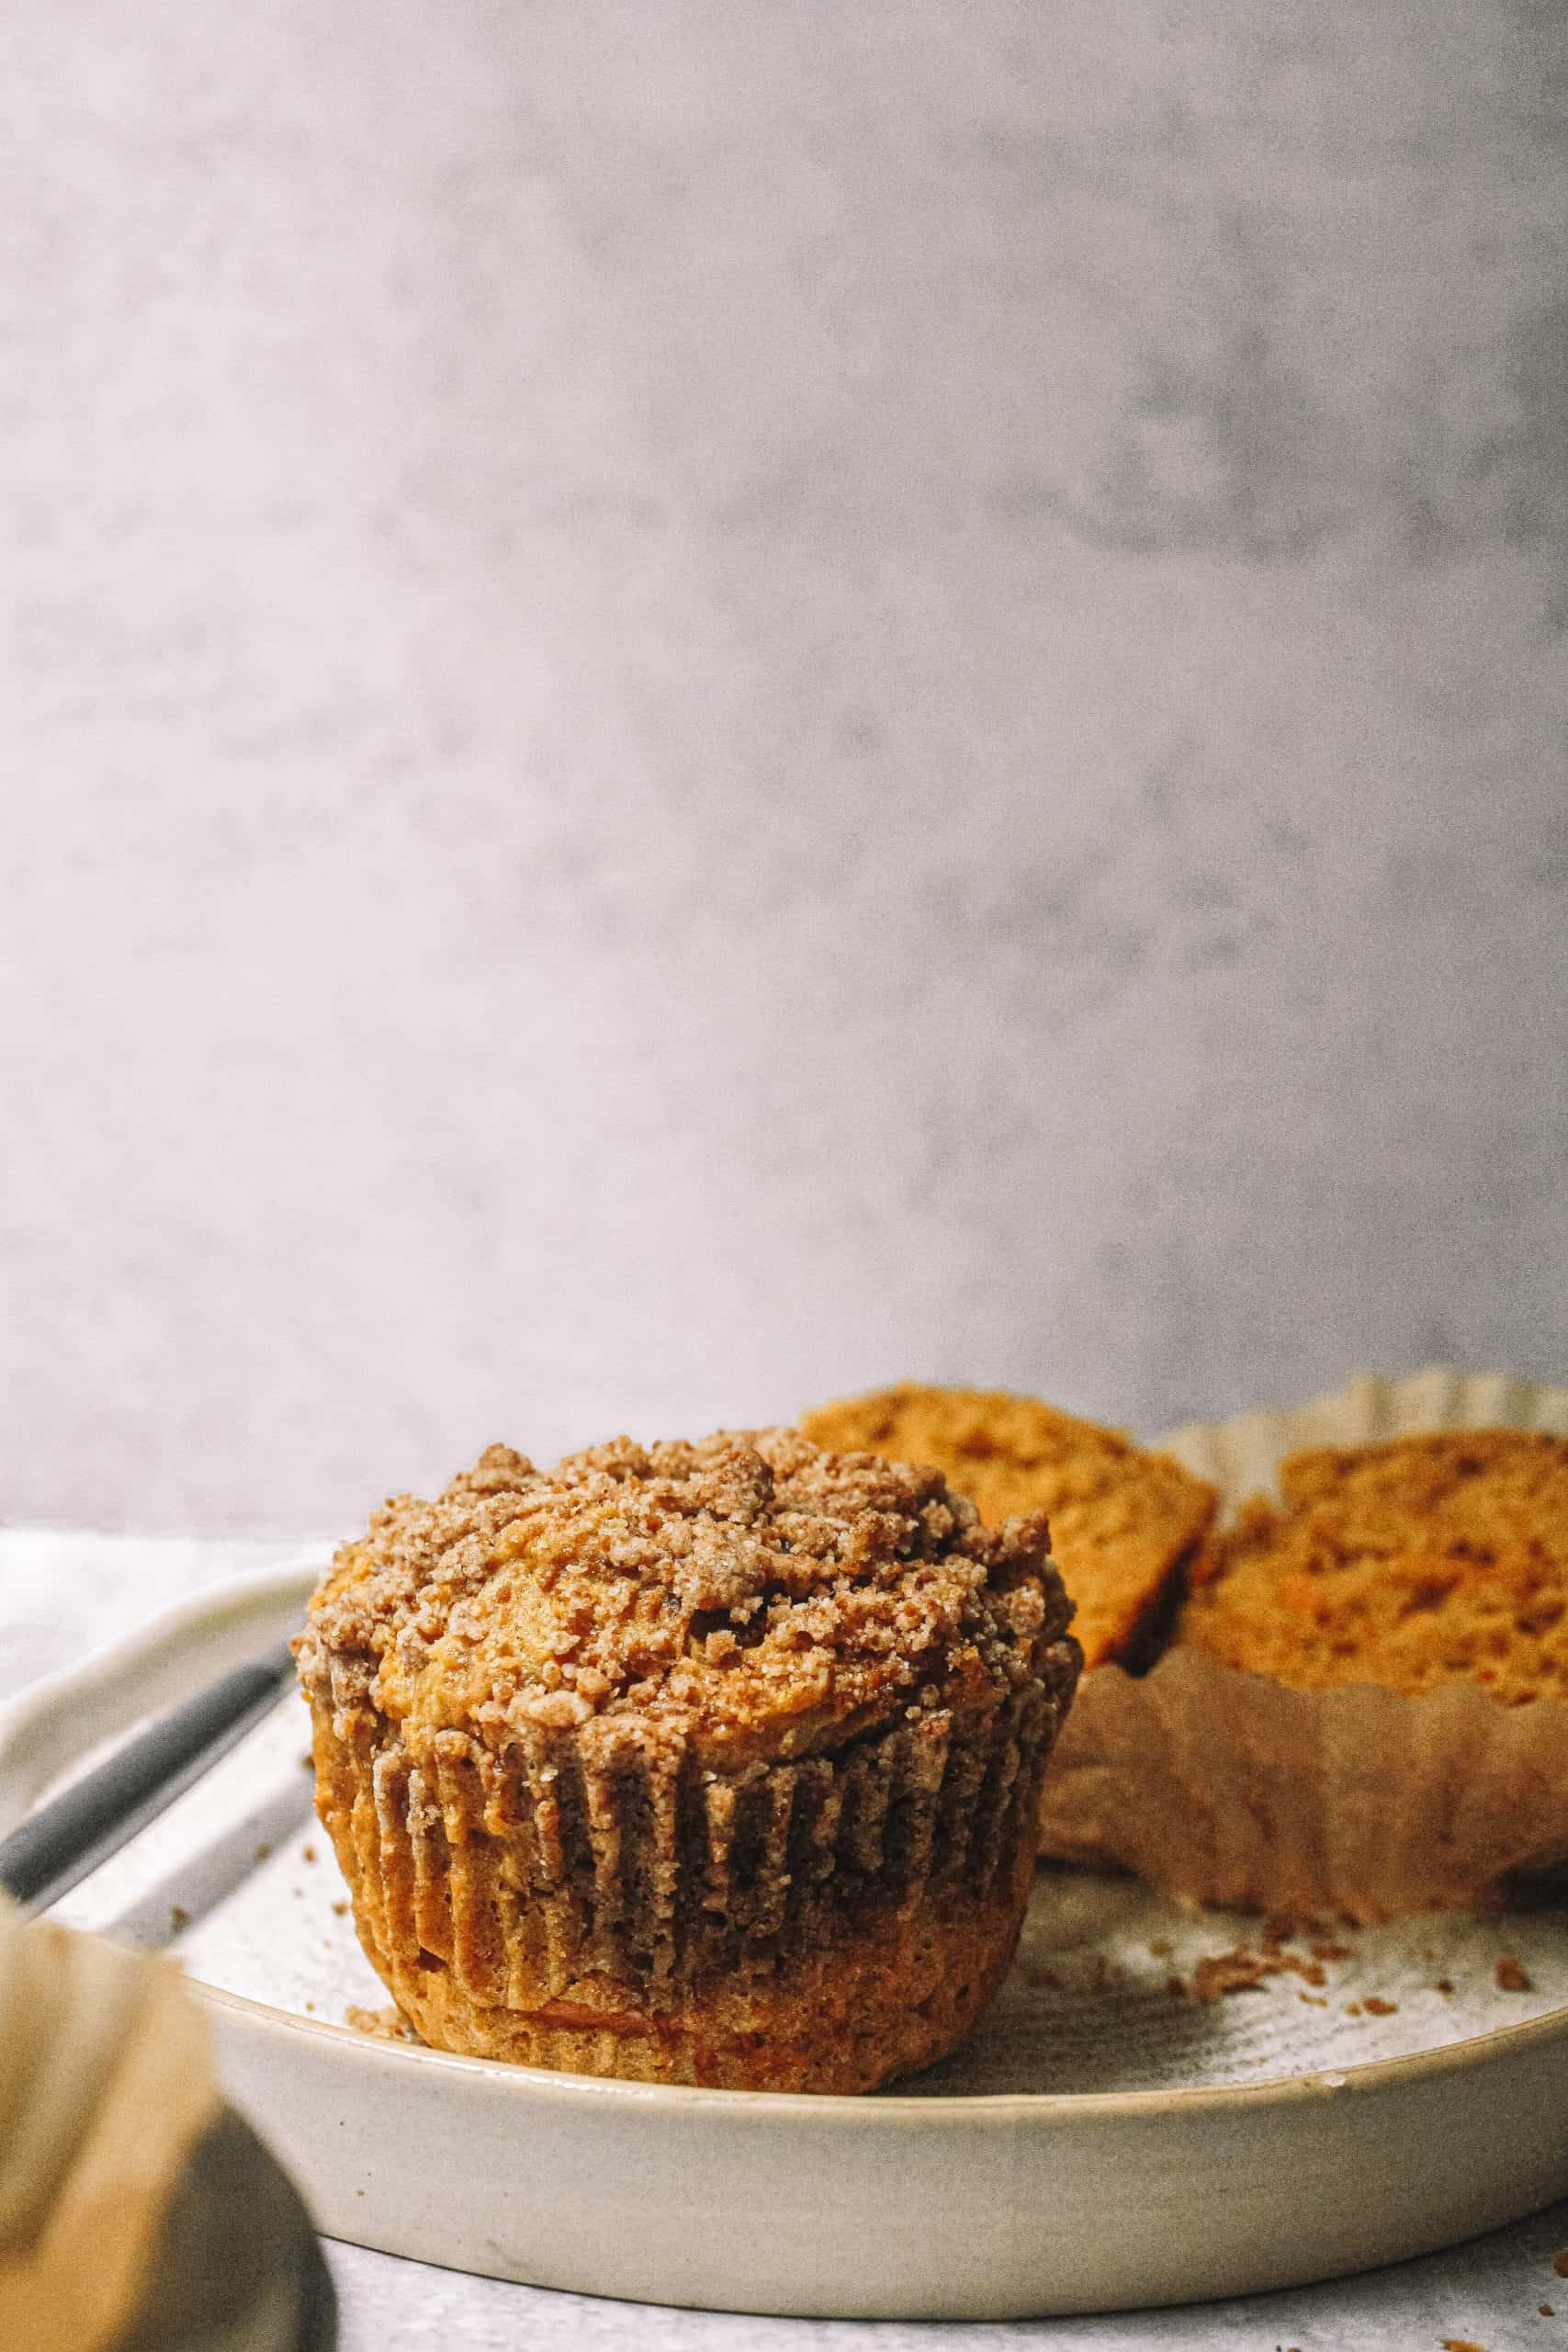 Streusel Topped Pumpkin Carrot Cake Muffins (Small Batch Recipe)